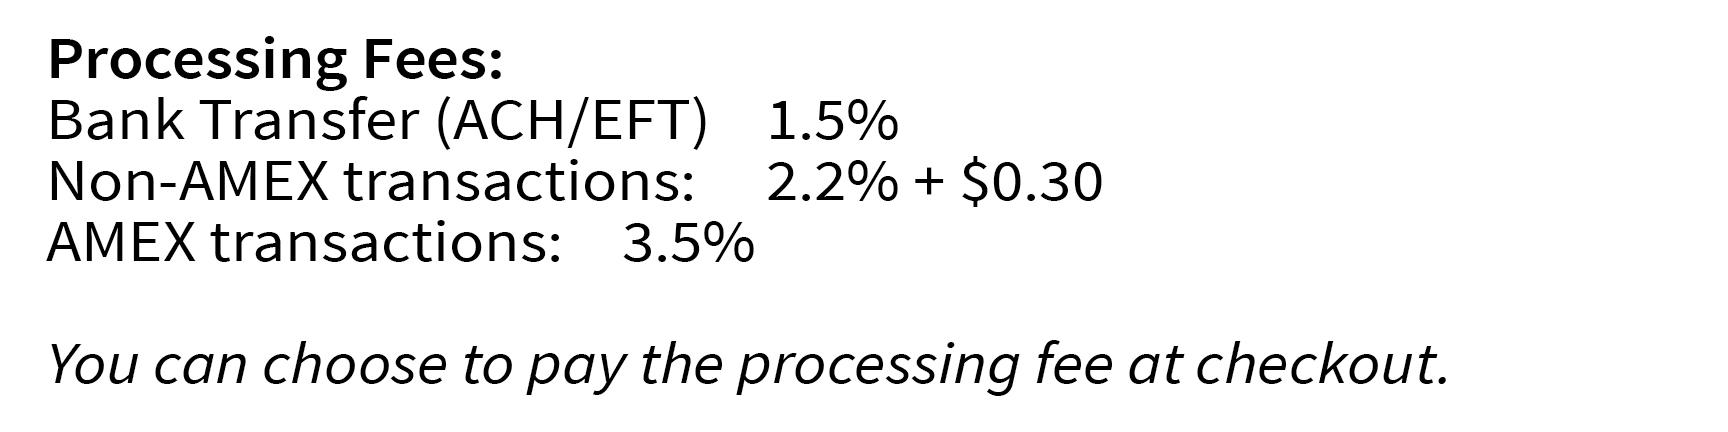 ELF Processing Fees3.jpg